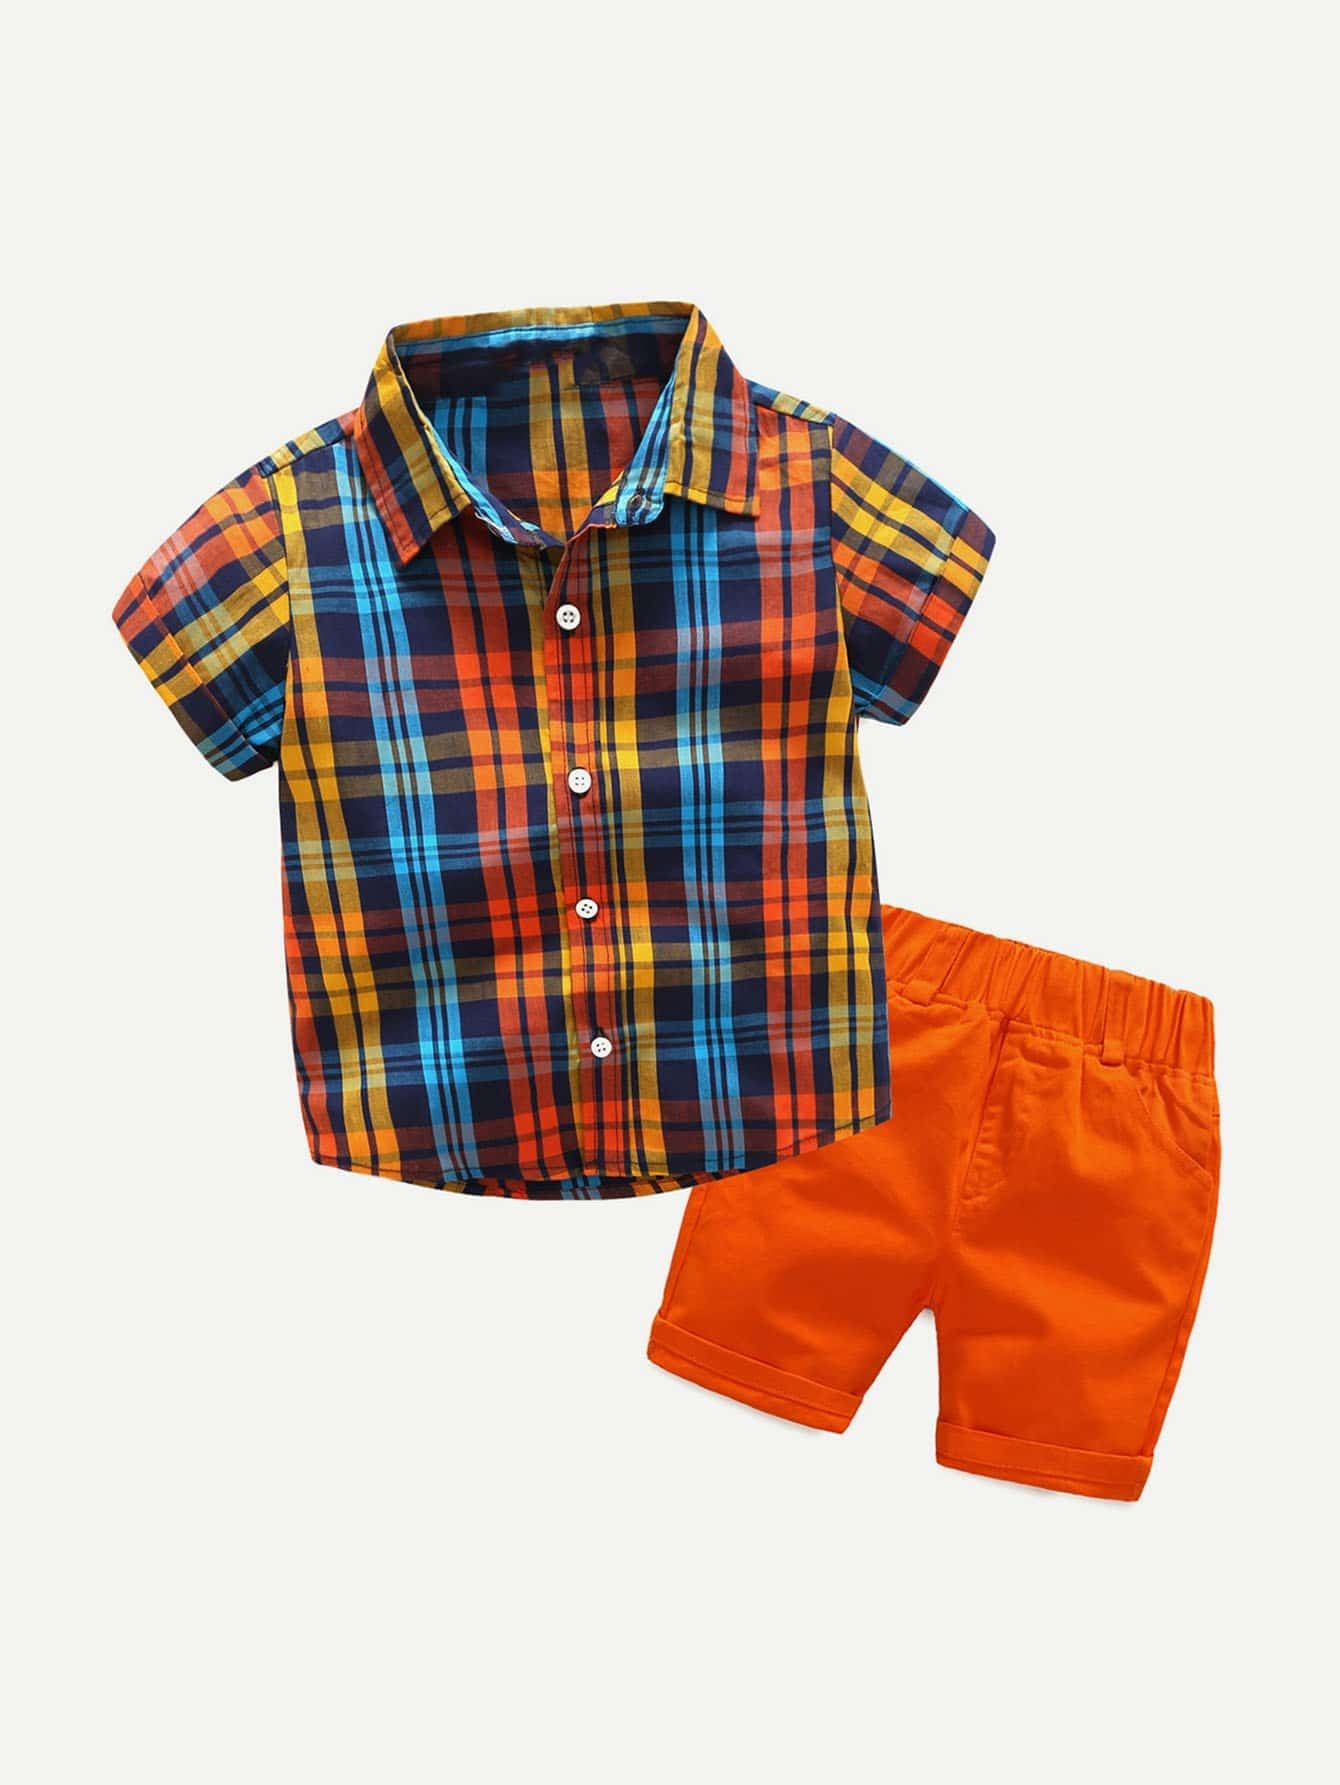 Boys Roll Up Sleeve Plaid Shirt With Shorts stoosh new salmon juniors roll tab sleeve plaid shirt s $34 dbfl